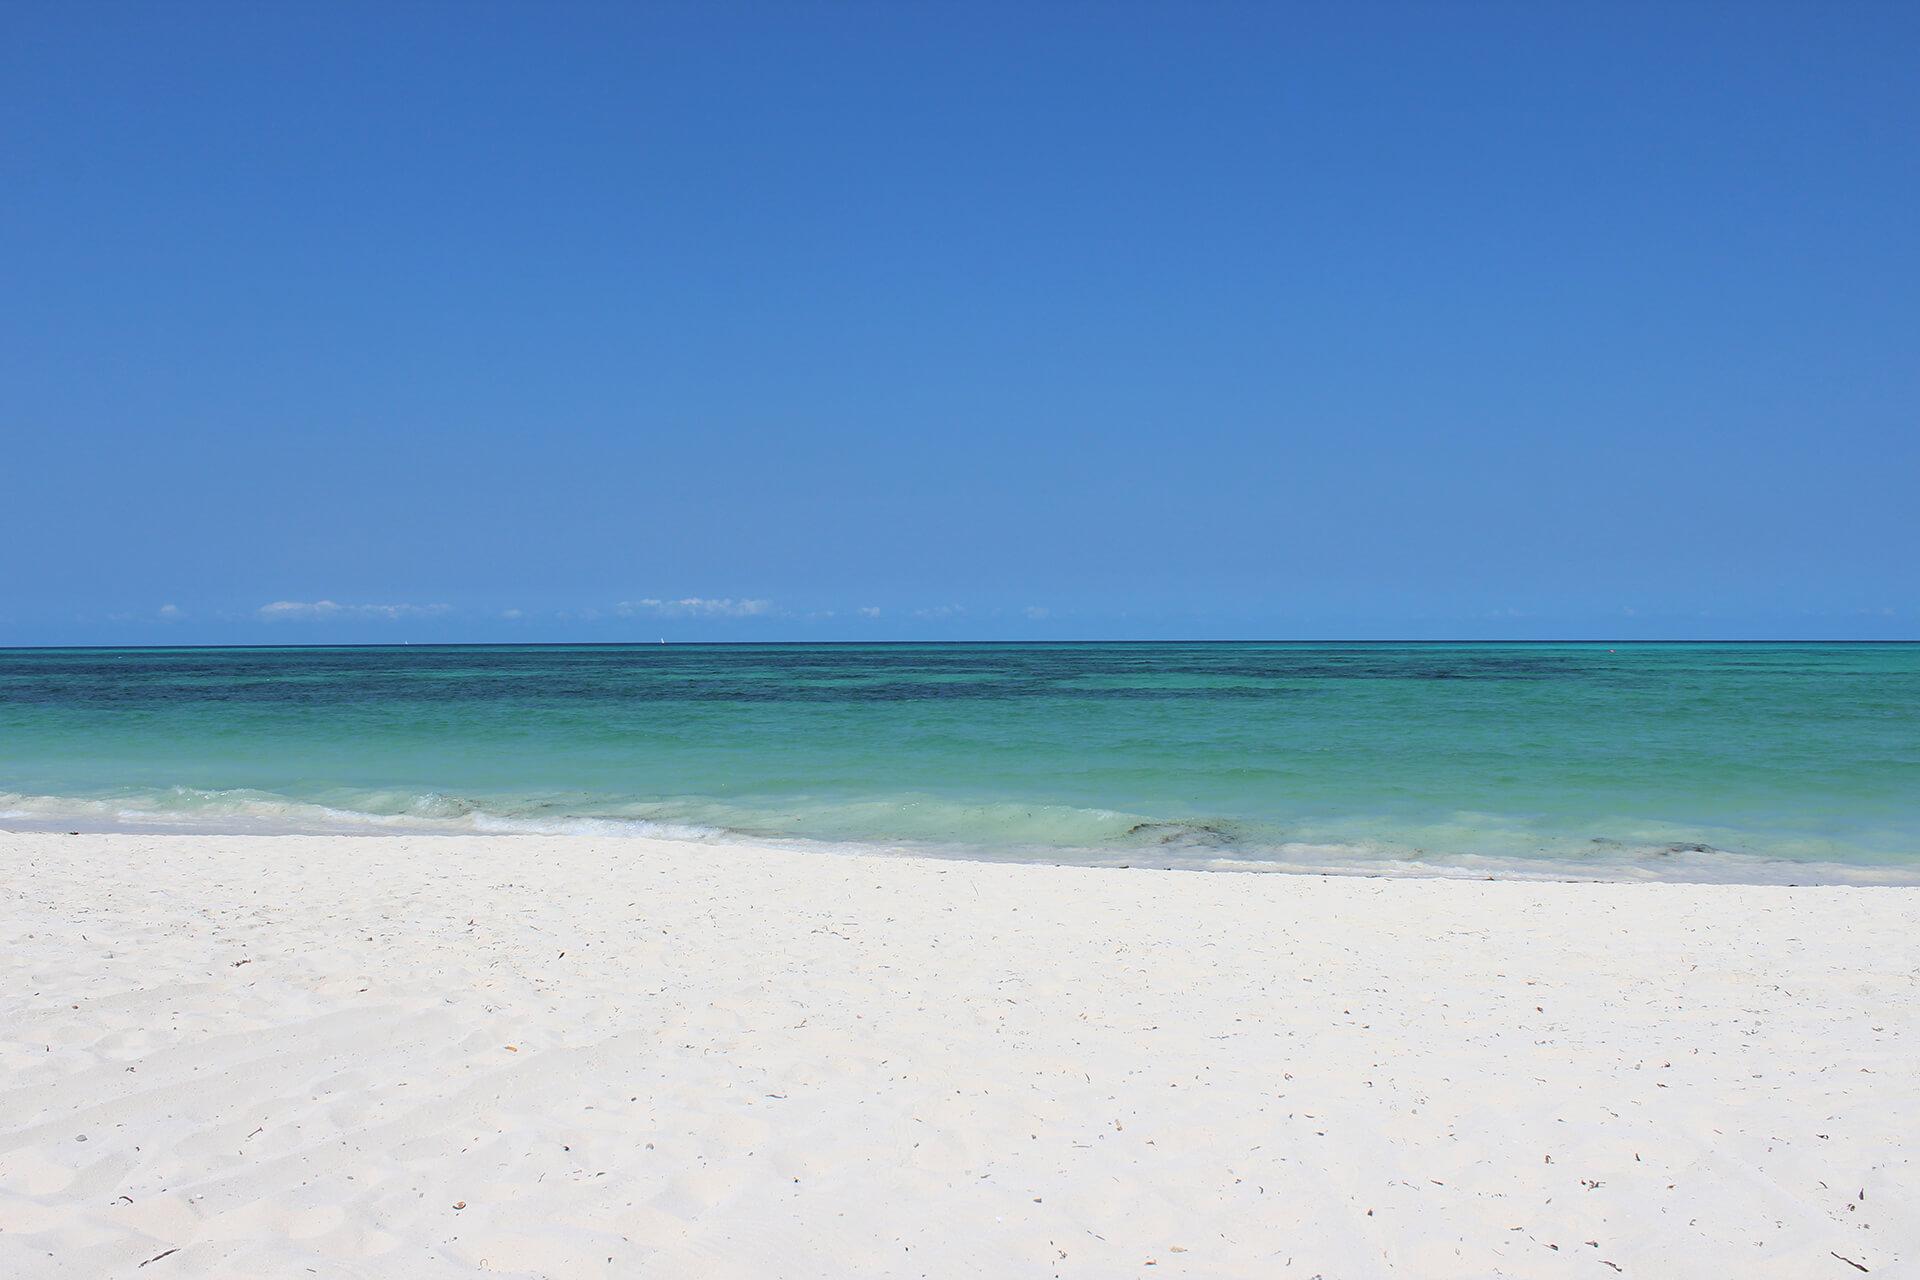 mare e spiagge e piscina vacanze zanzibar kiwengwa